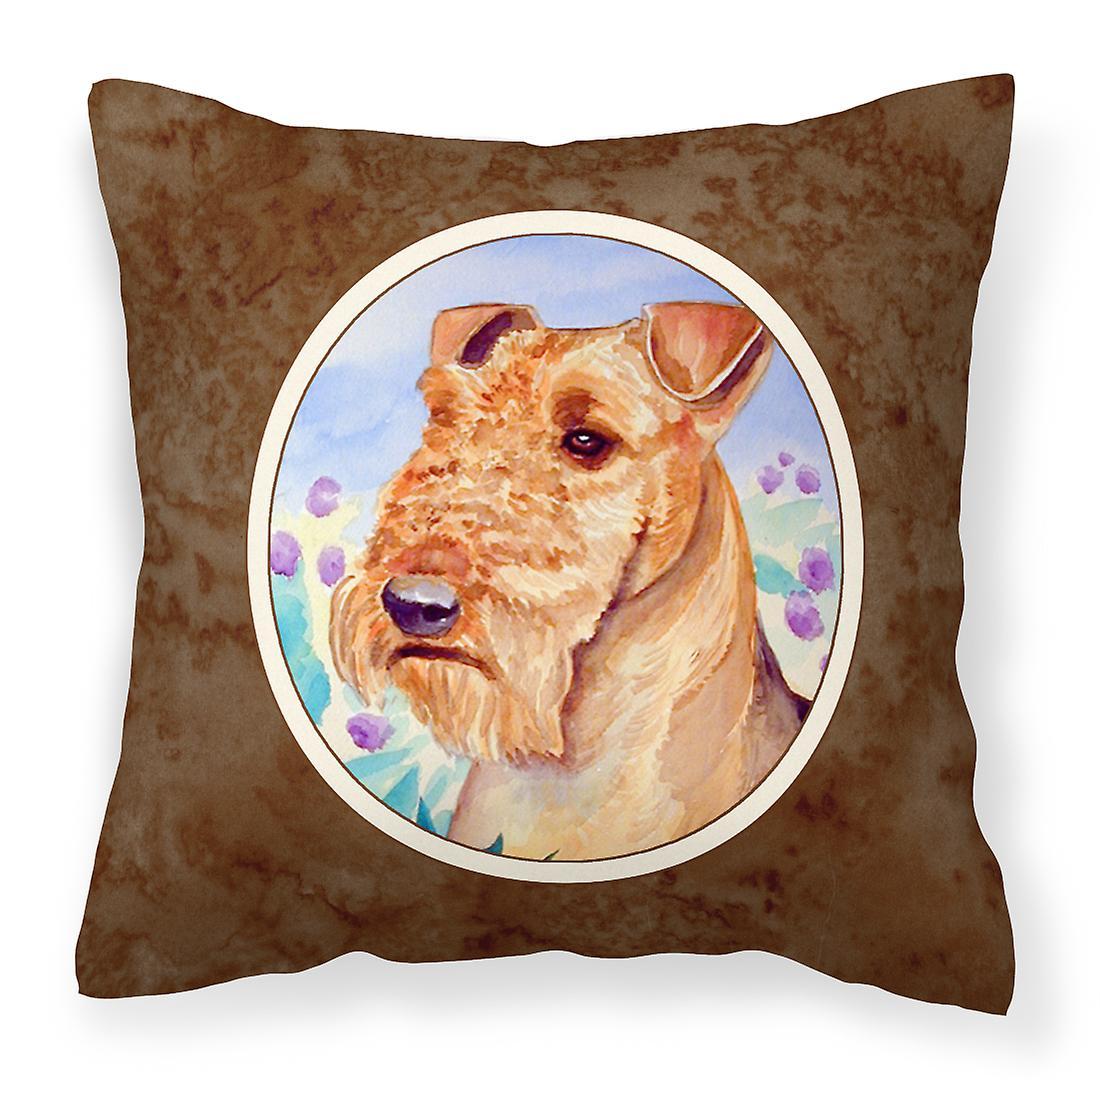 Oreiller Terrier Airedale En Tissu Fleurs Décoratif stQrChdx